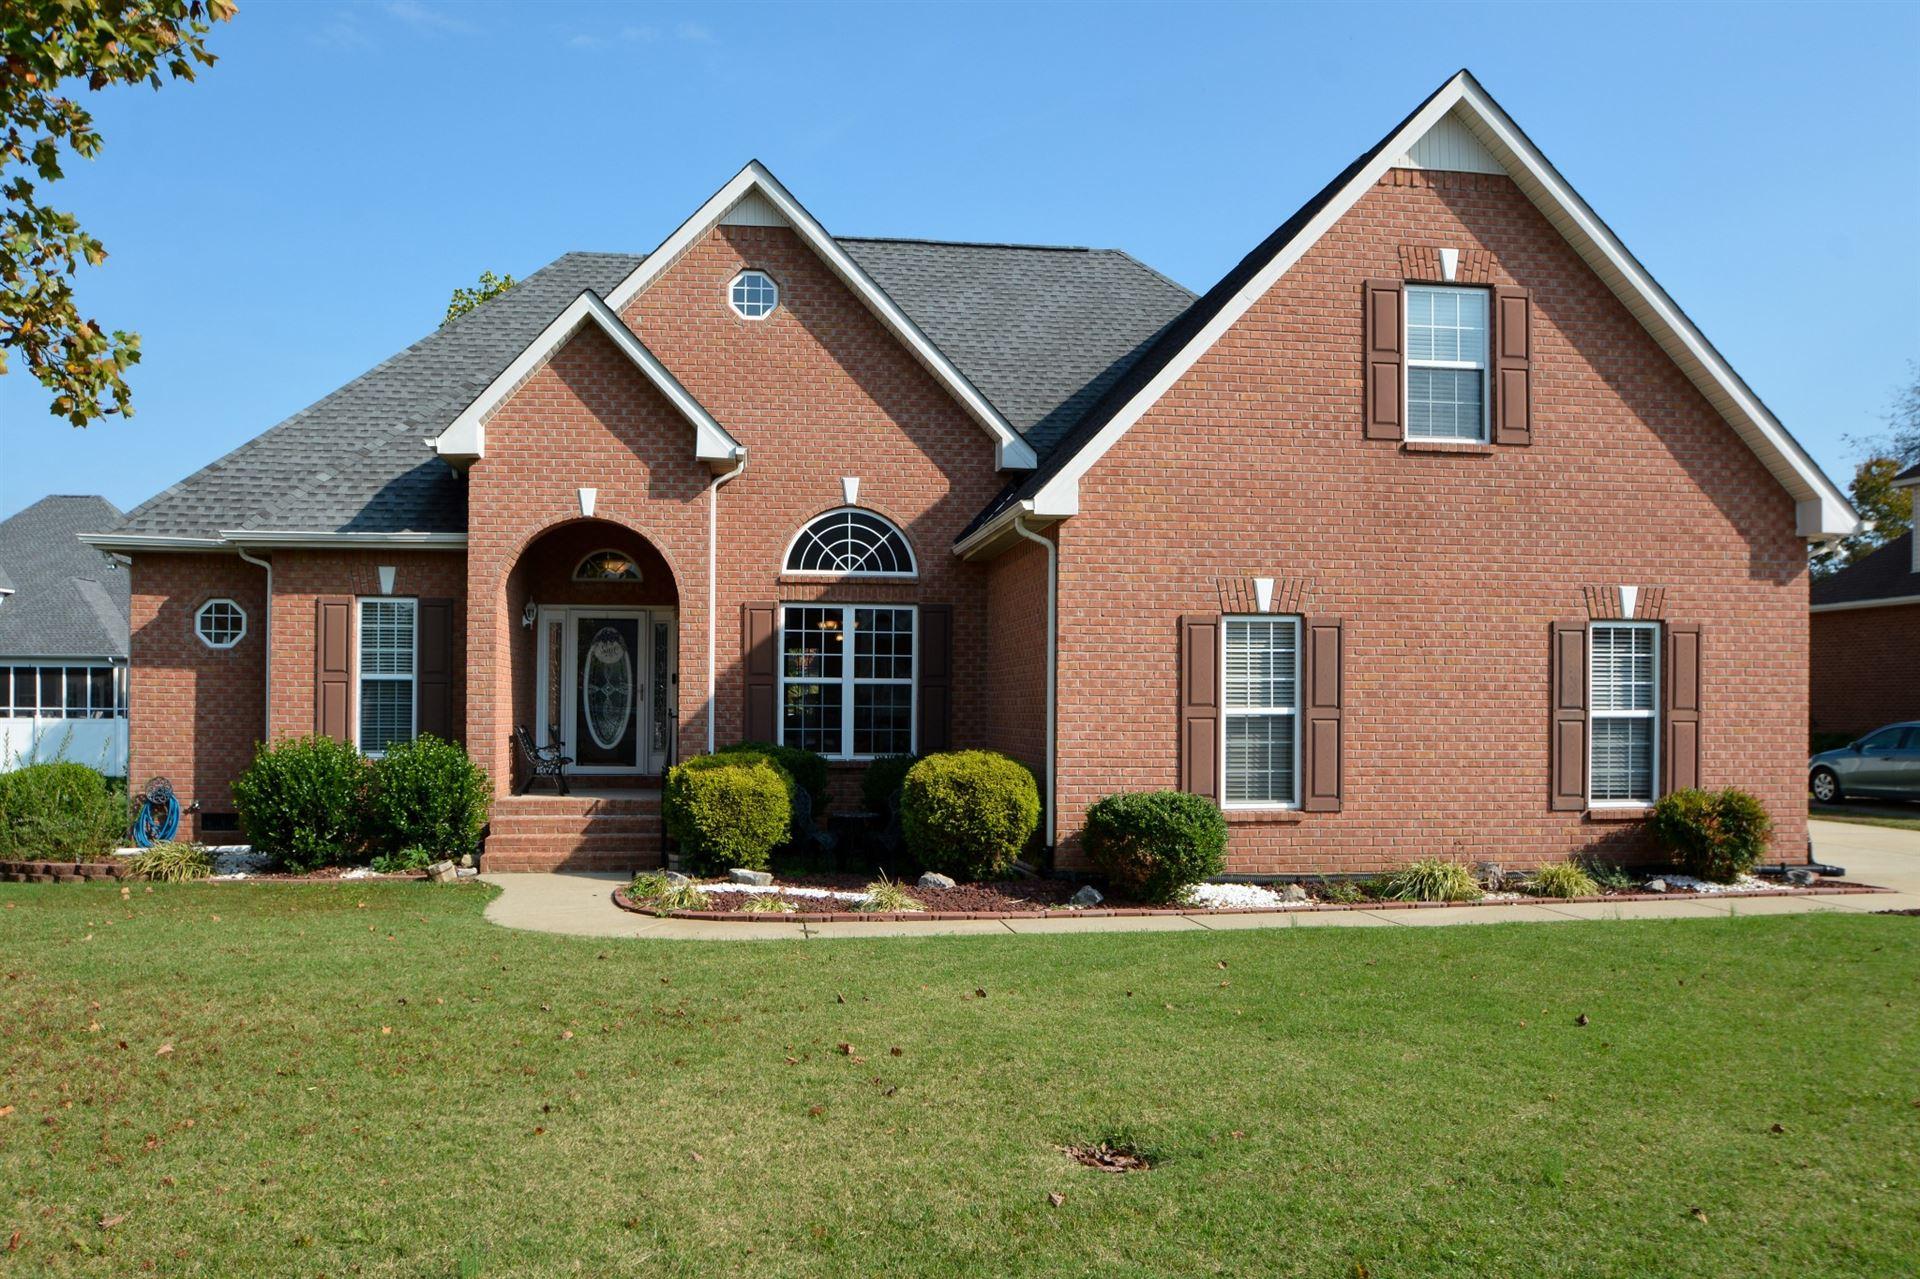 3025 Tybee Trl, Murfreesboro, TN 37127 - MLS#: 2200449